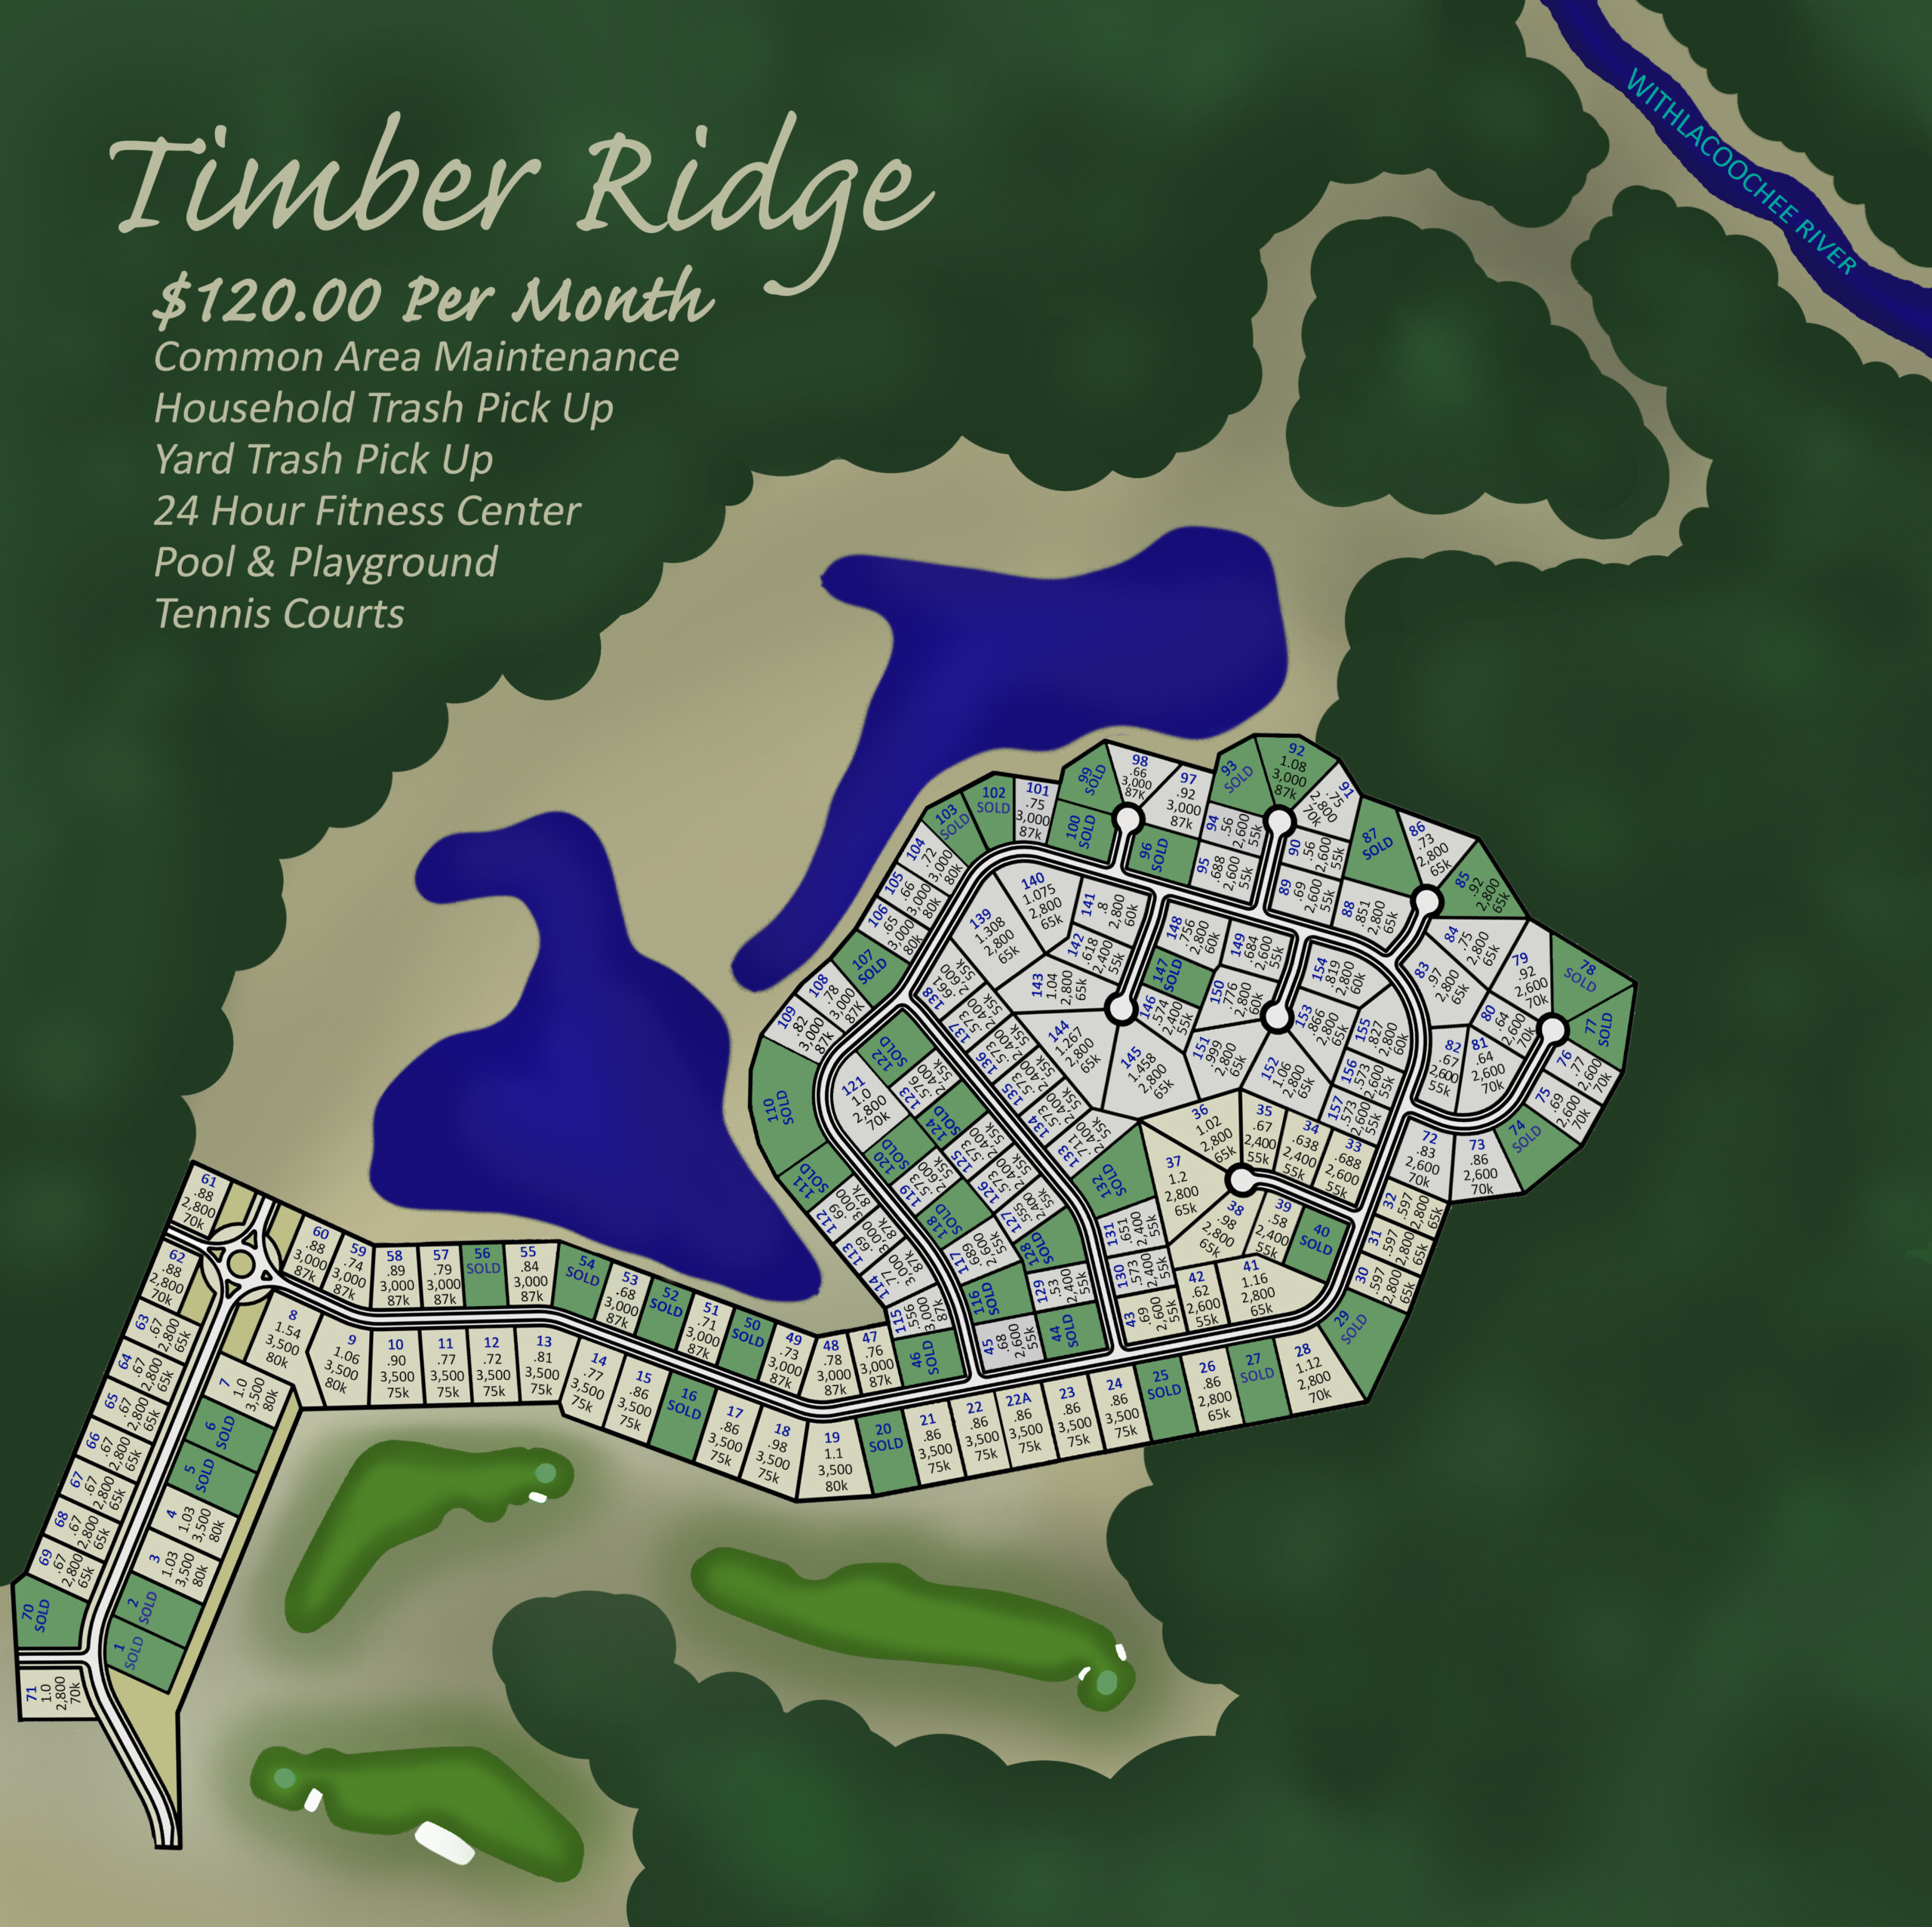 Timber Ridge Lot Map